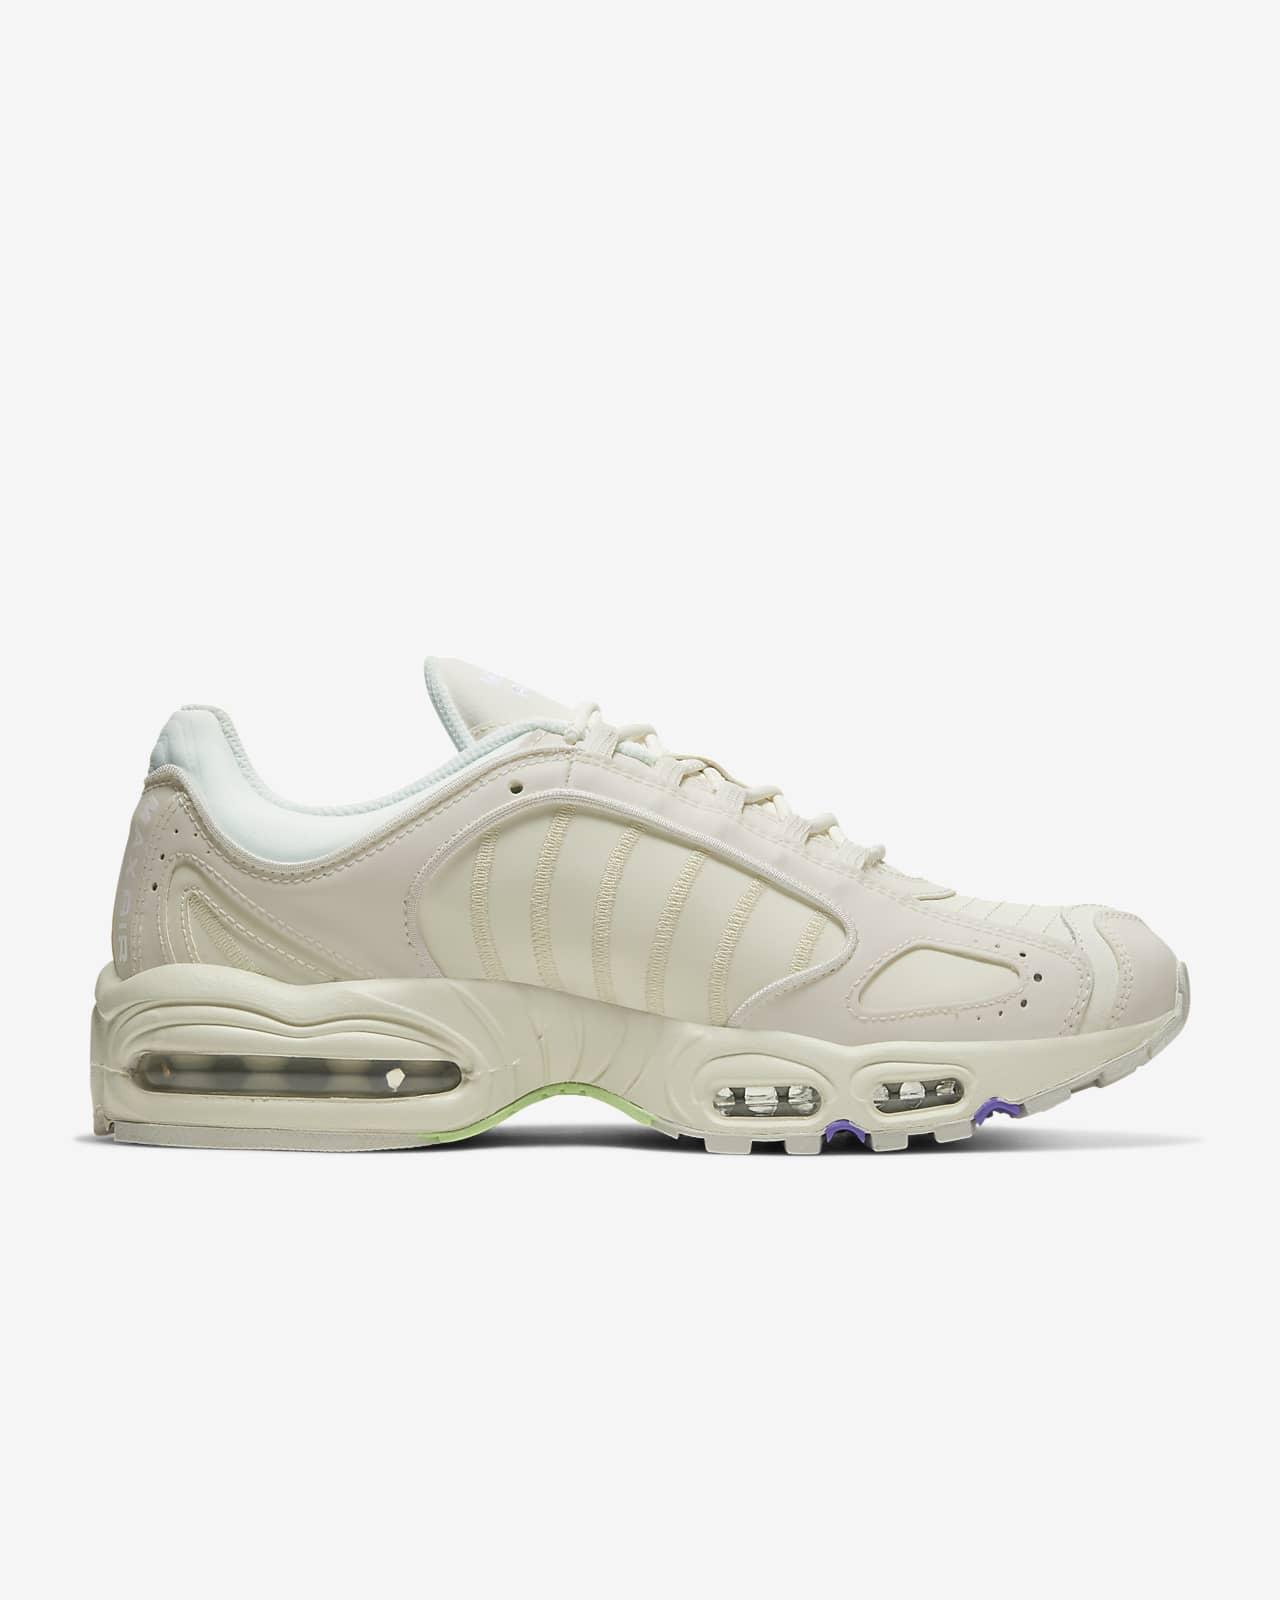 nike tailwind men's shoes